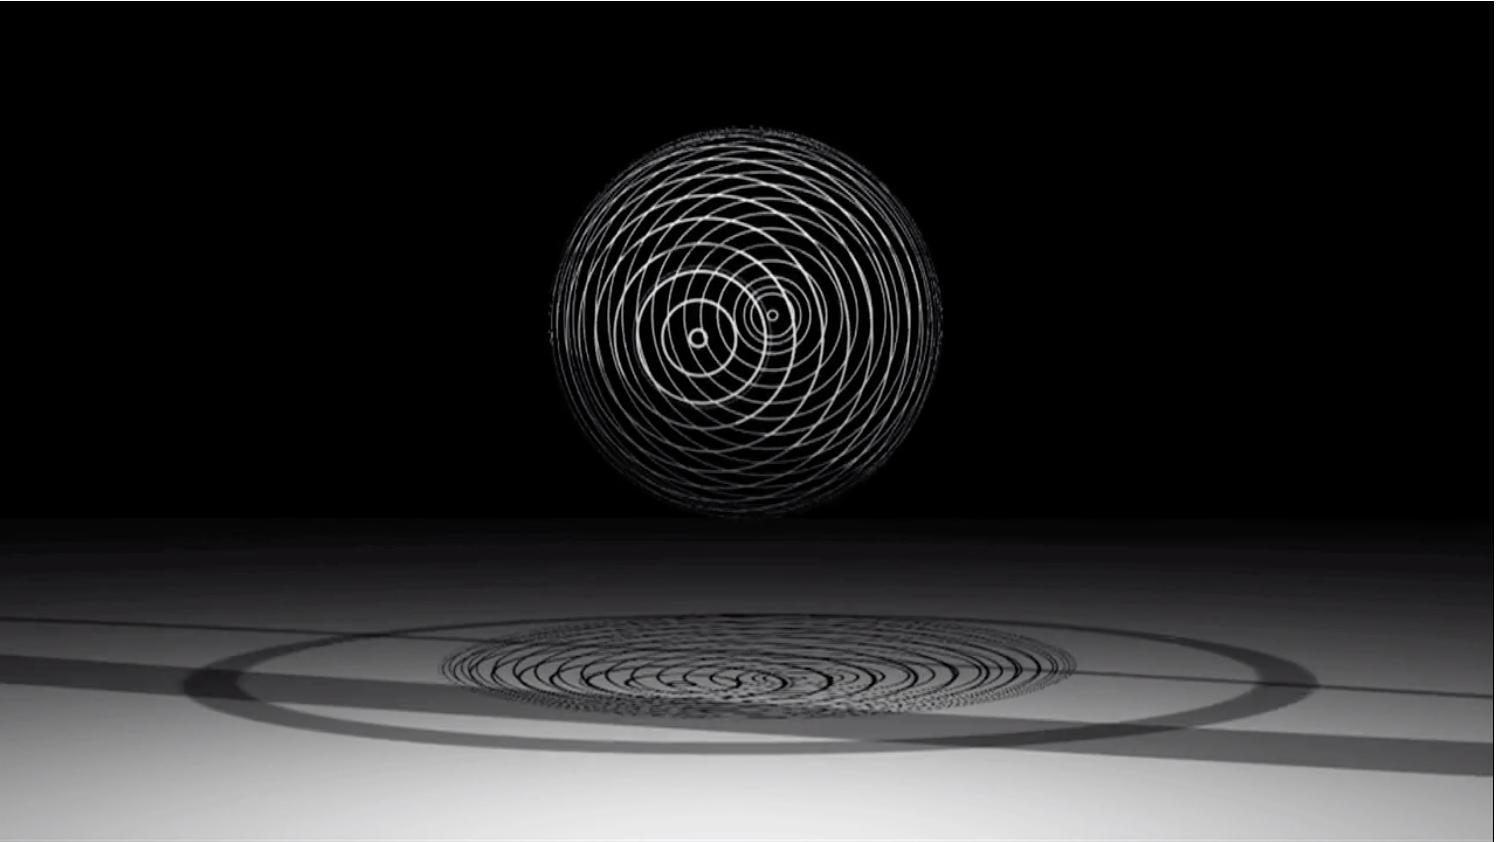 Arc,Circle,Sphere